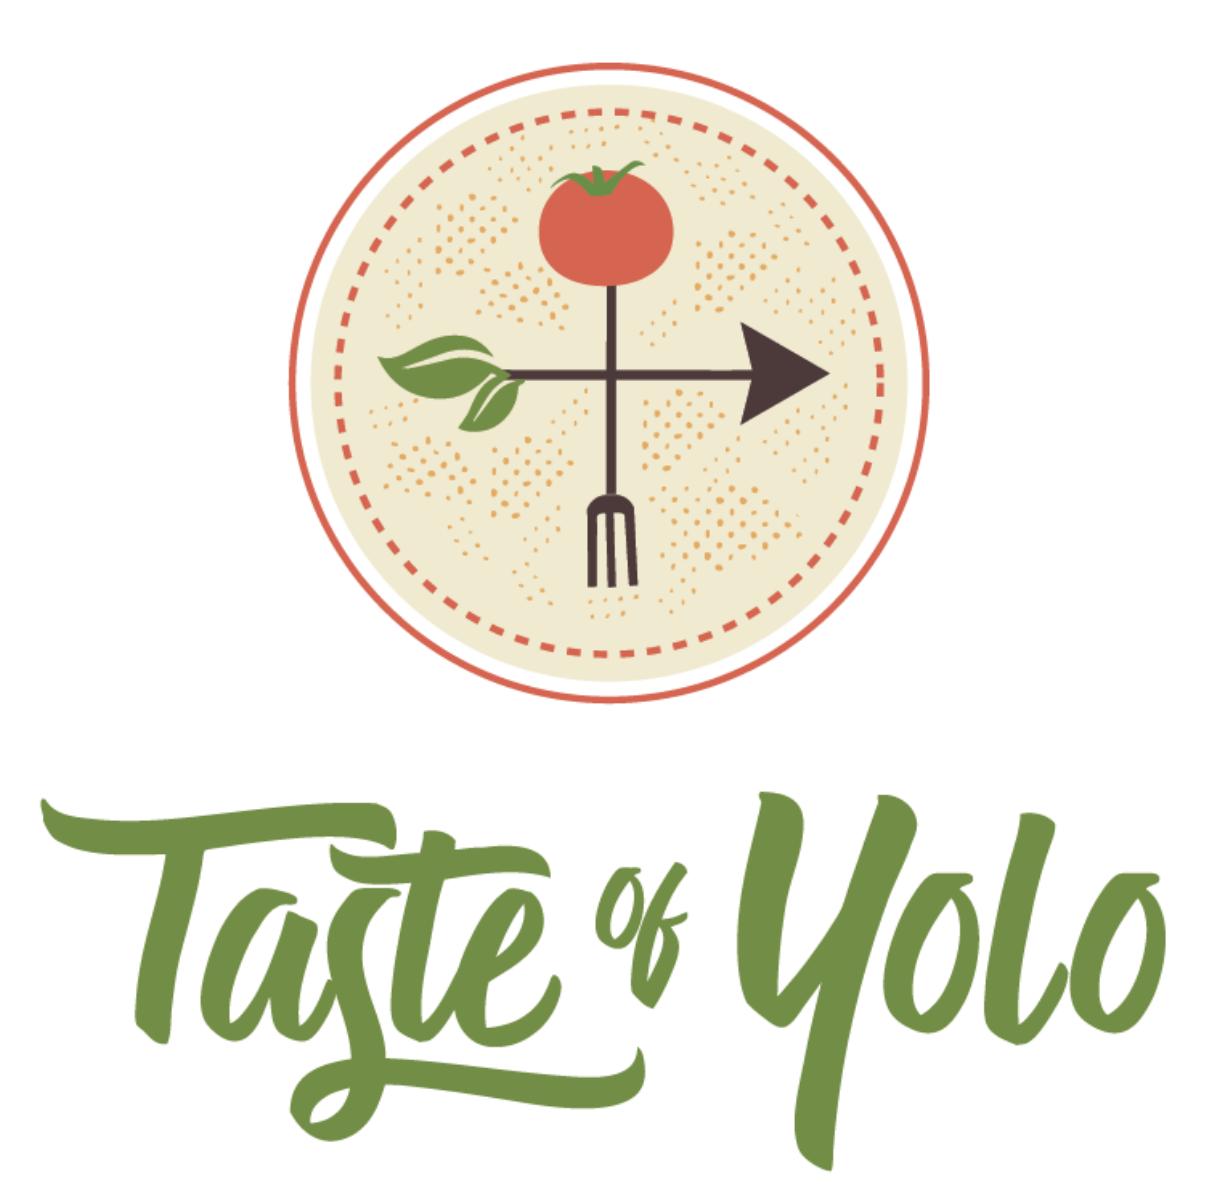 Taste of Yolo